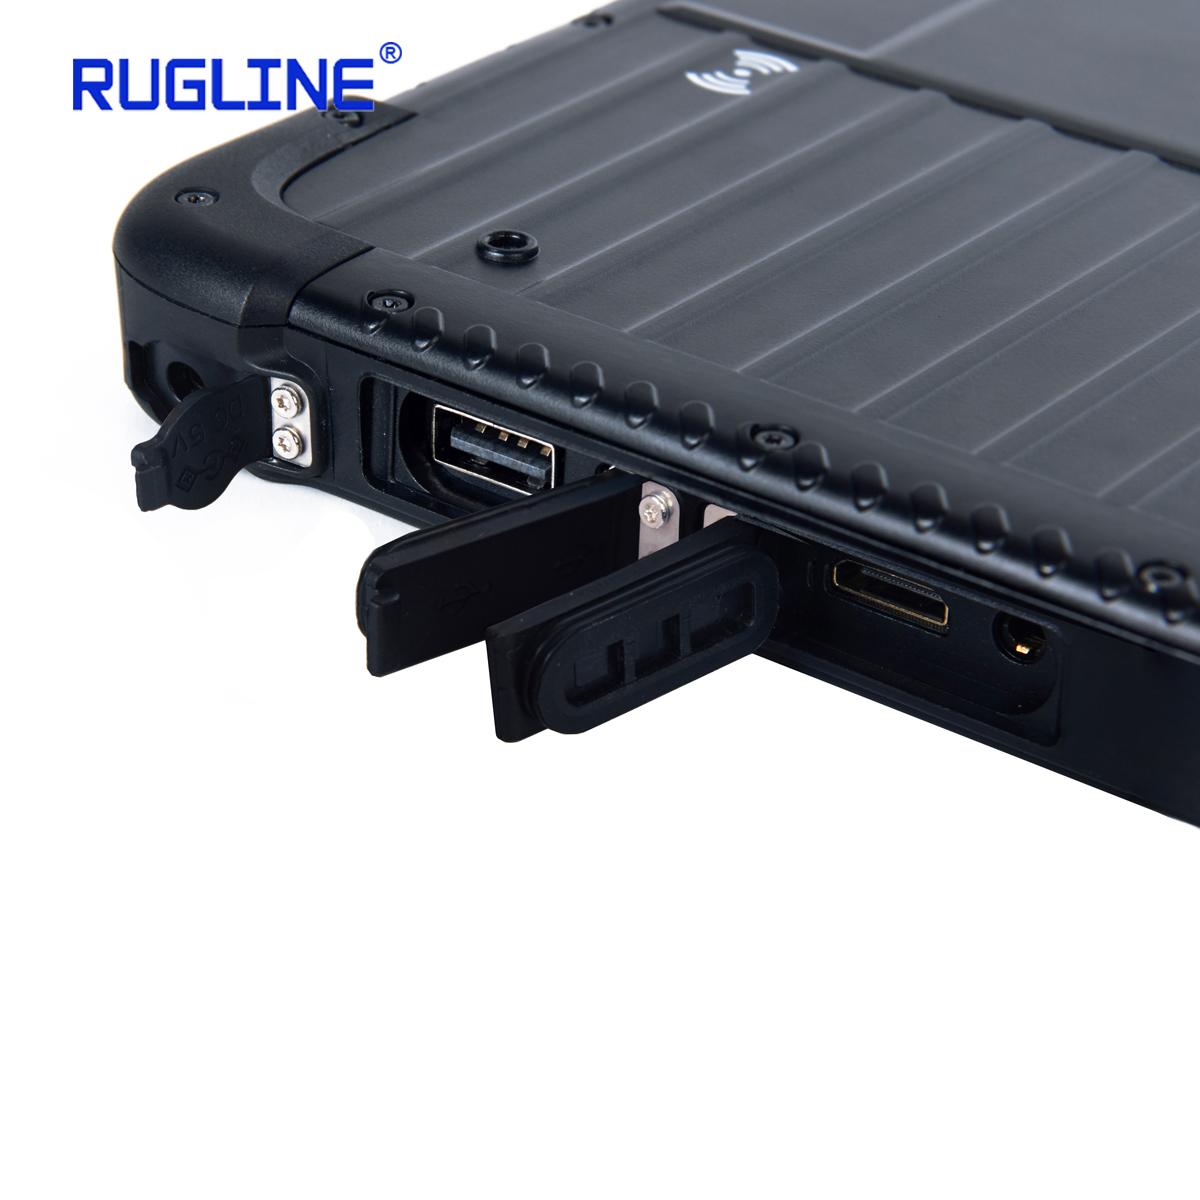 rugged windows tablet (11)